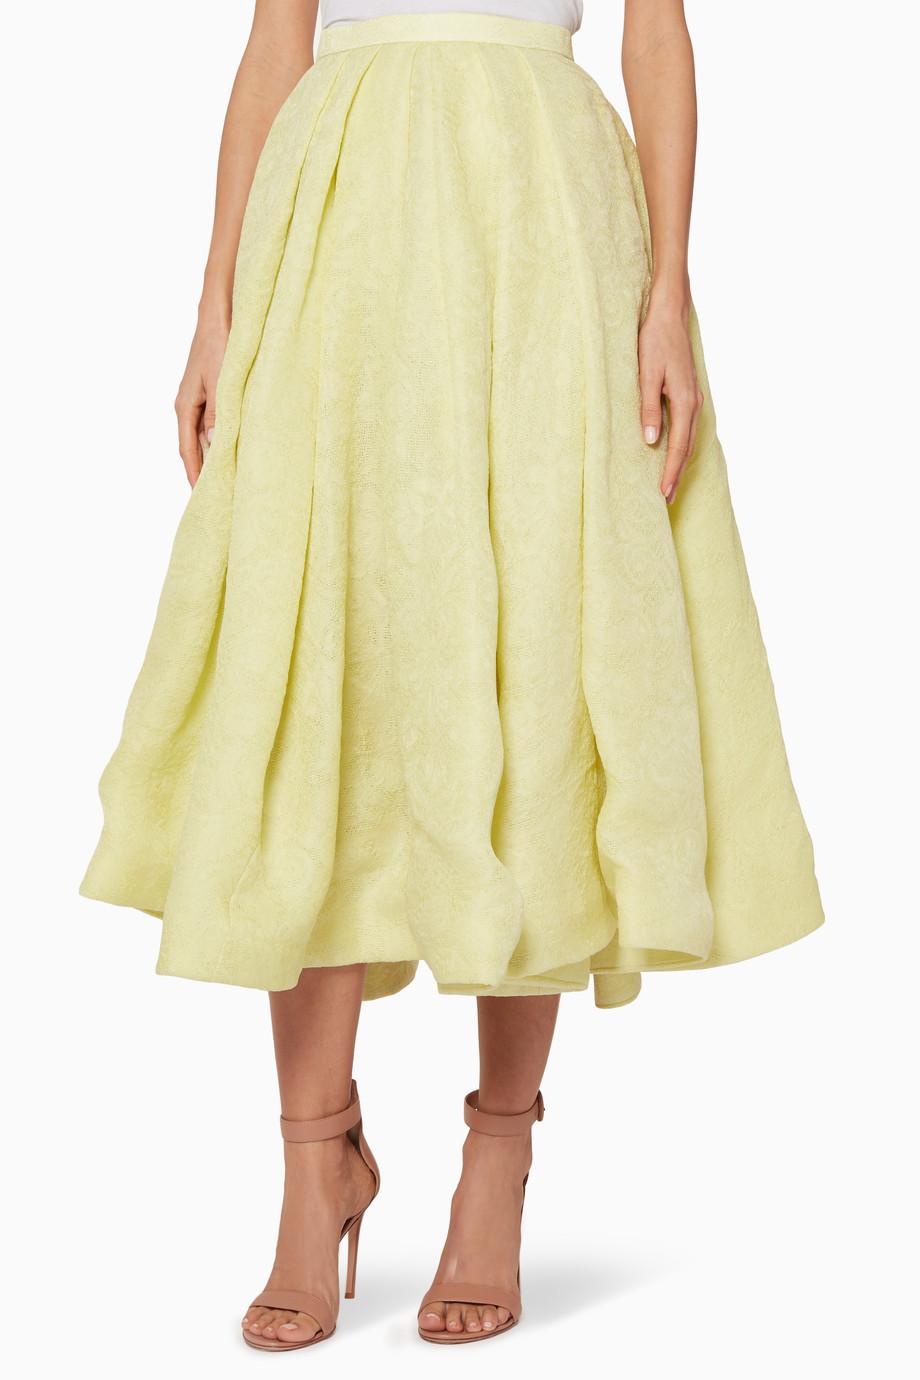 dc438ef1997fe تسوق تنورة بحواف منفوشة باللون الأصفر الهادئ Rosie Assoulin اصفر ...